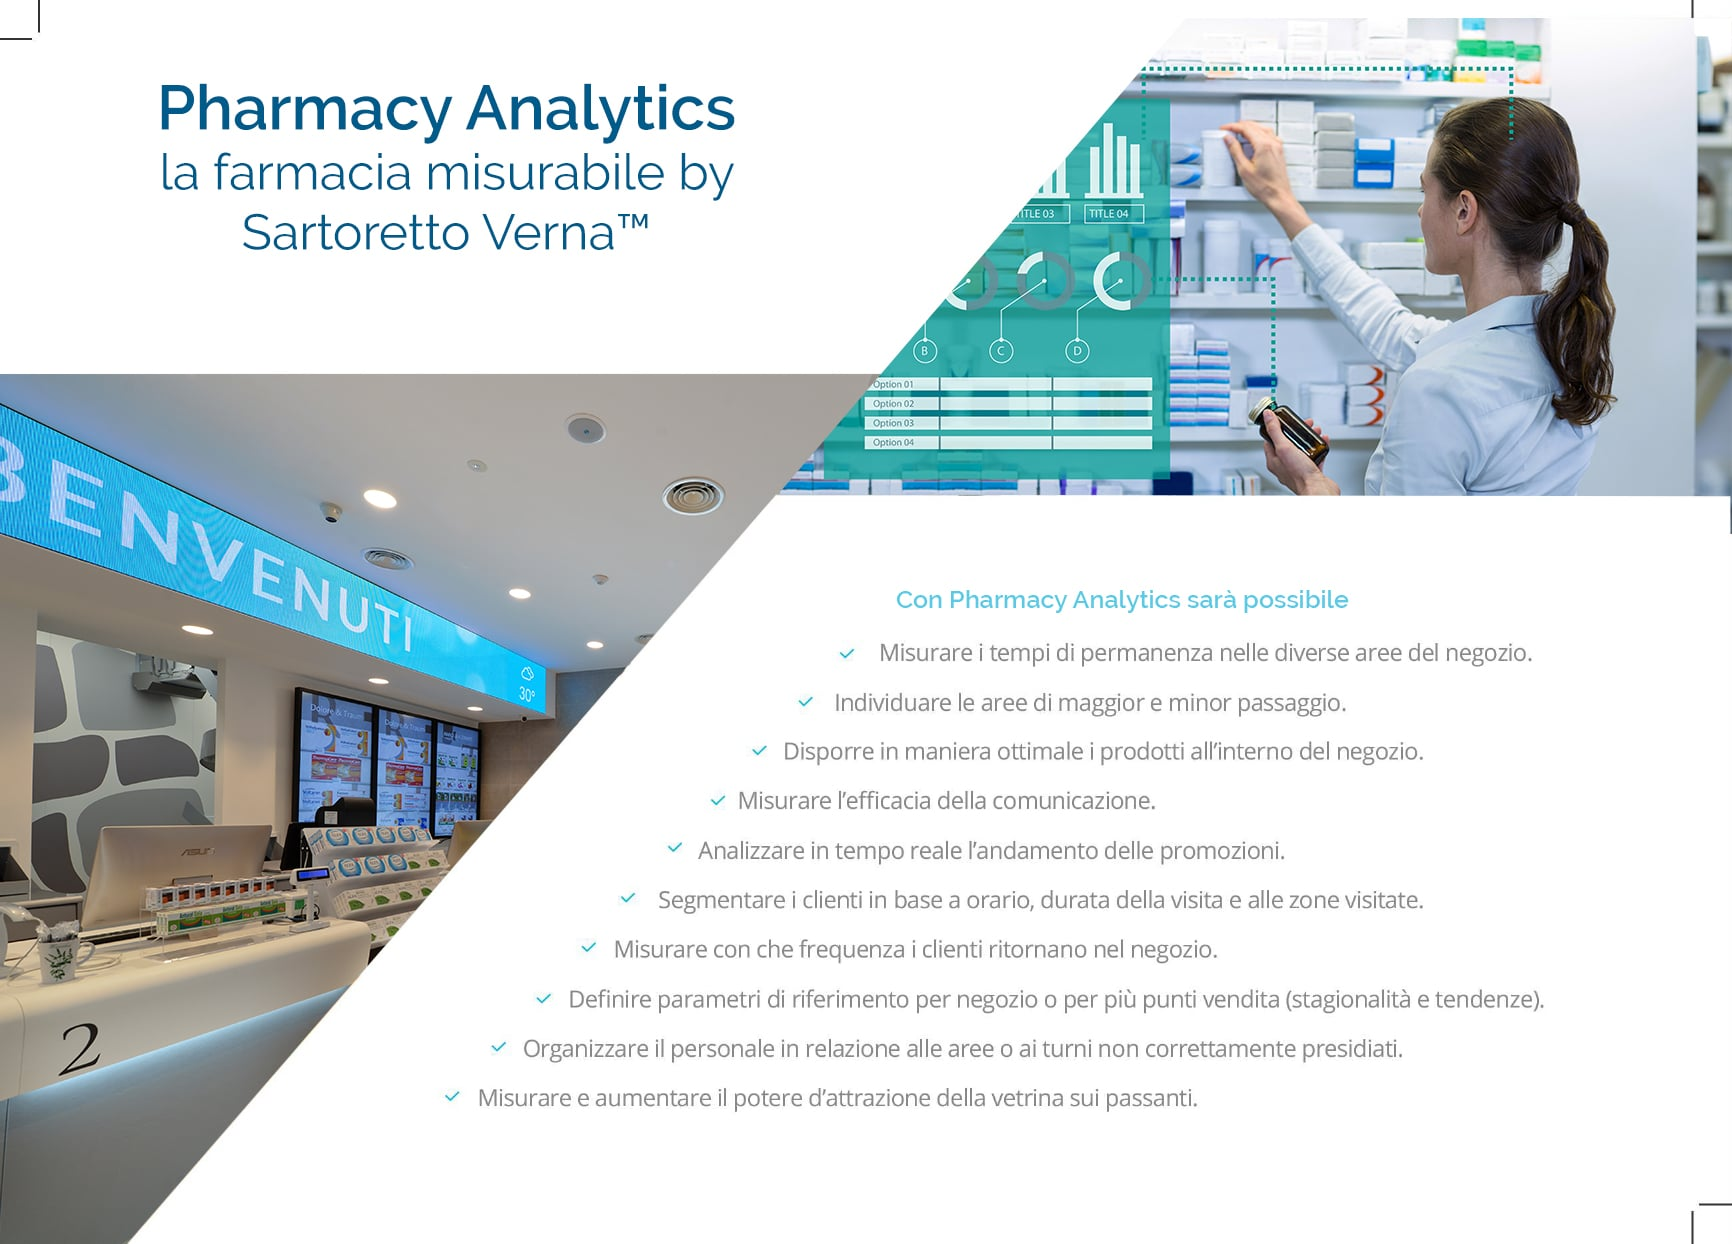 Pharmacy-analytics